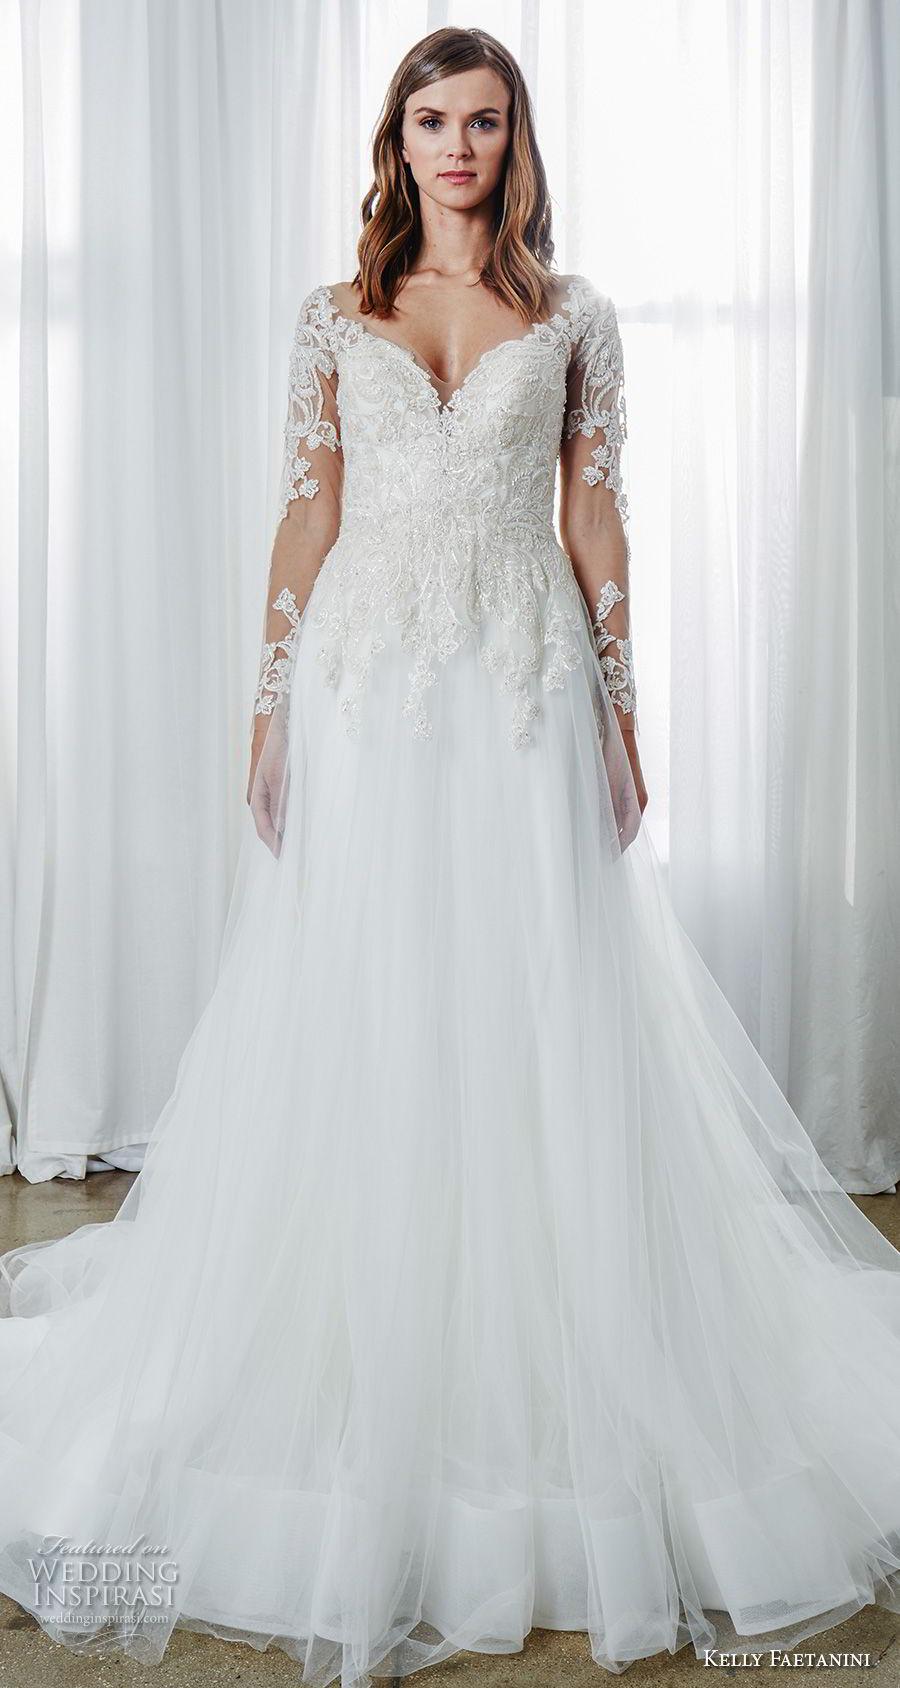 Kelly Faetanini Spring 2019 Bridal Long Sleeves Sweetheart Neckline Full Embellishment A Line Wedding Dress